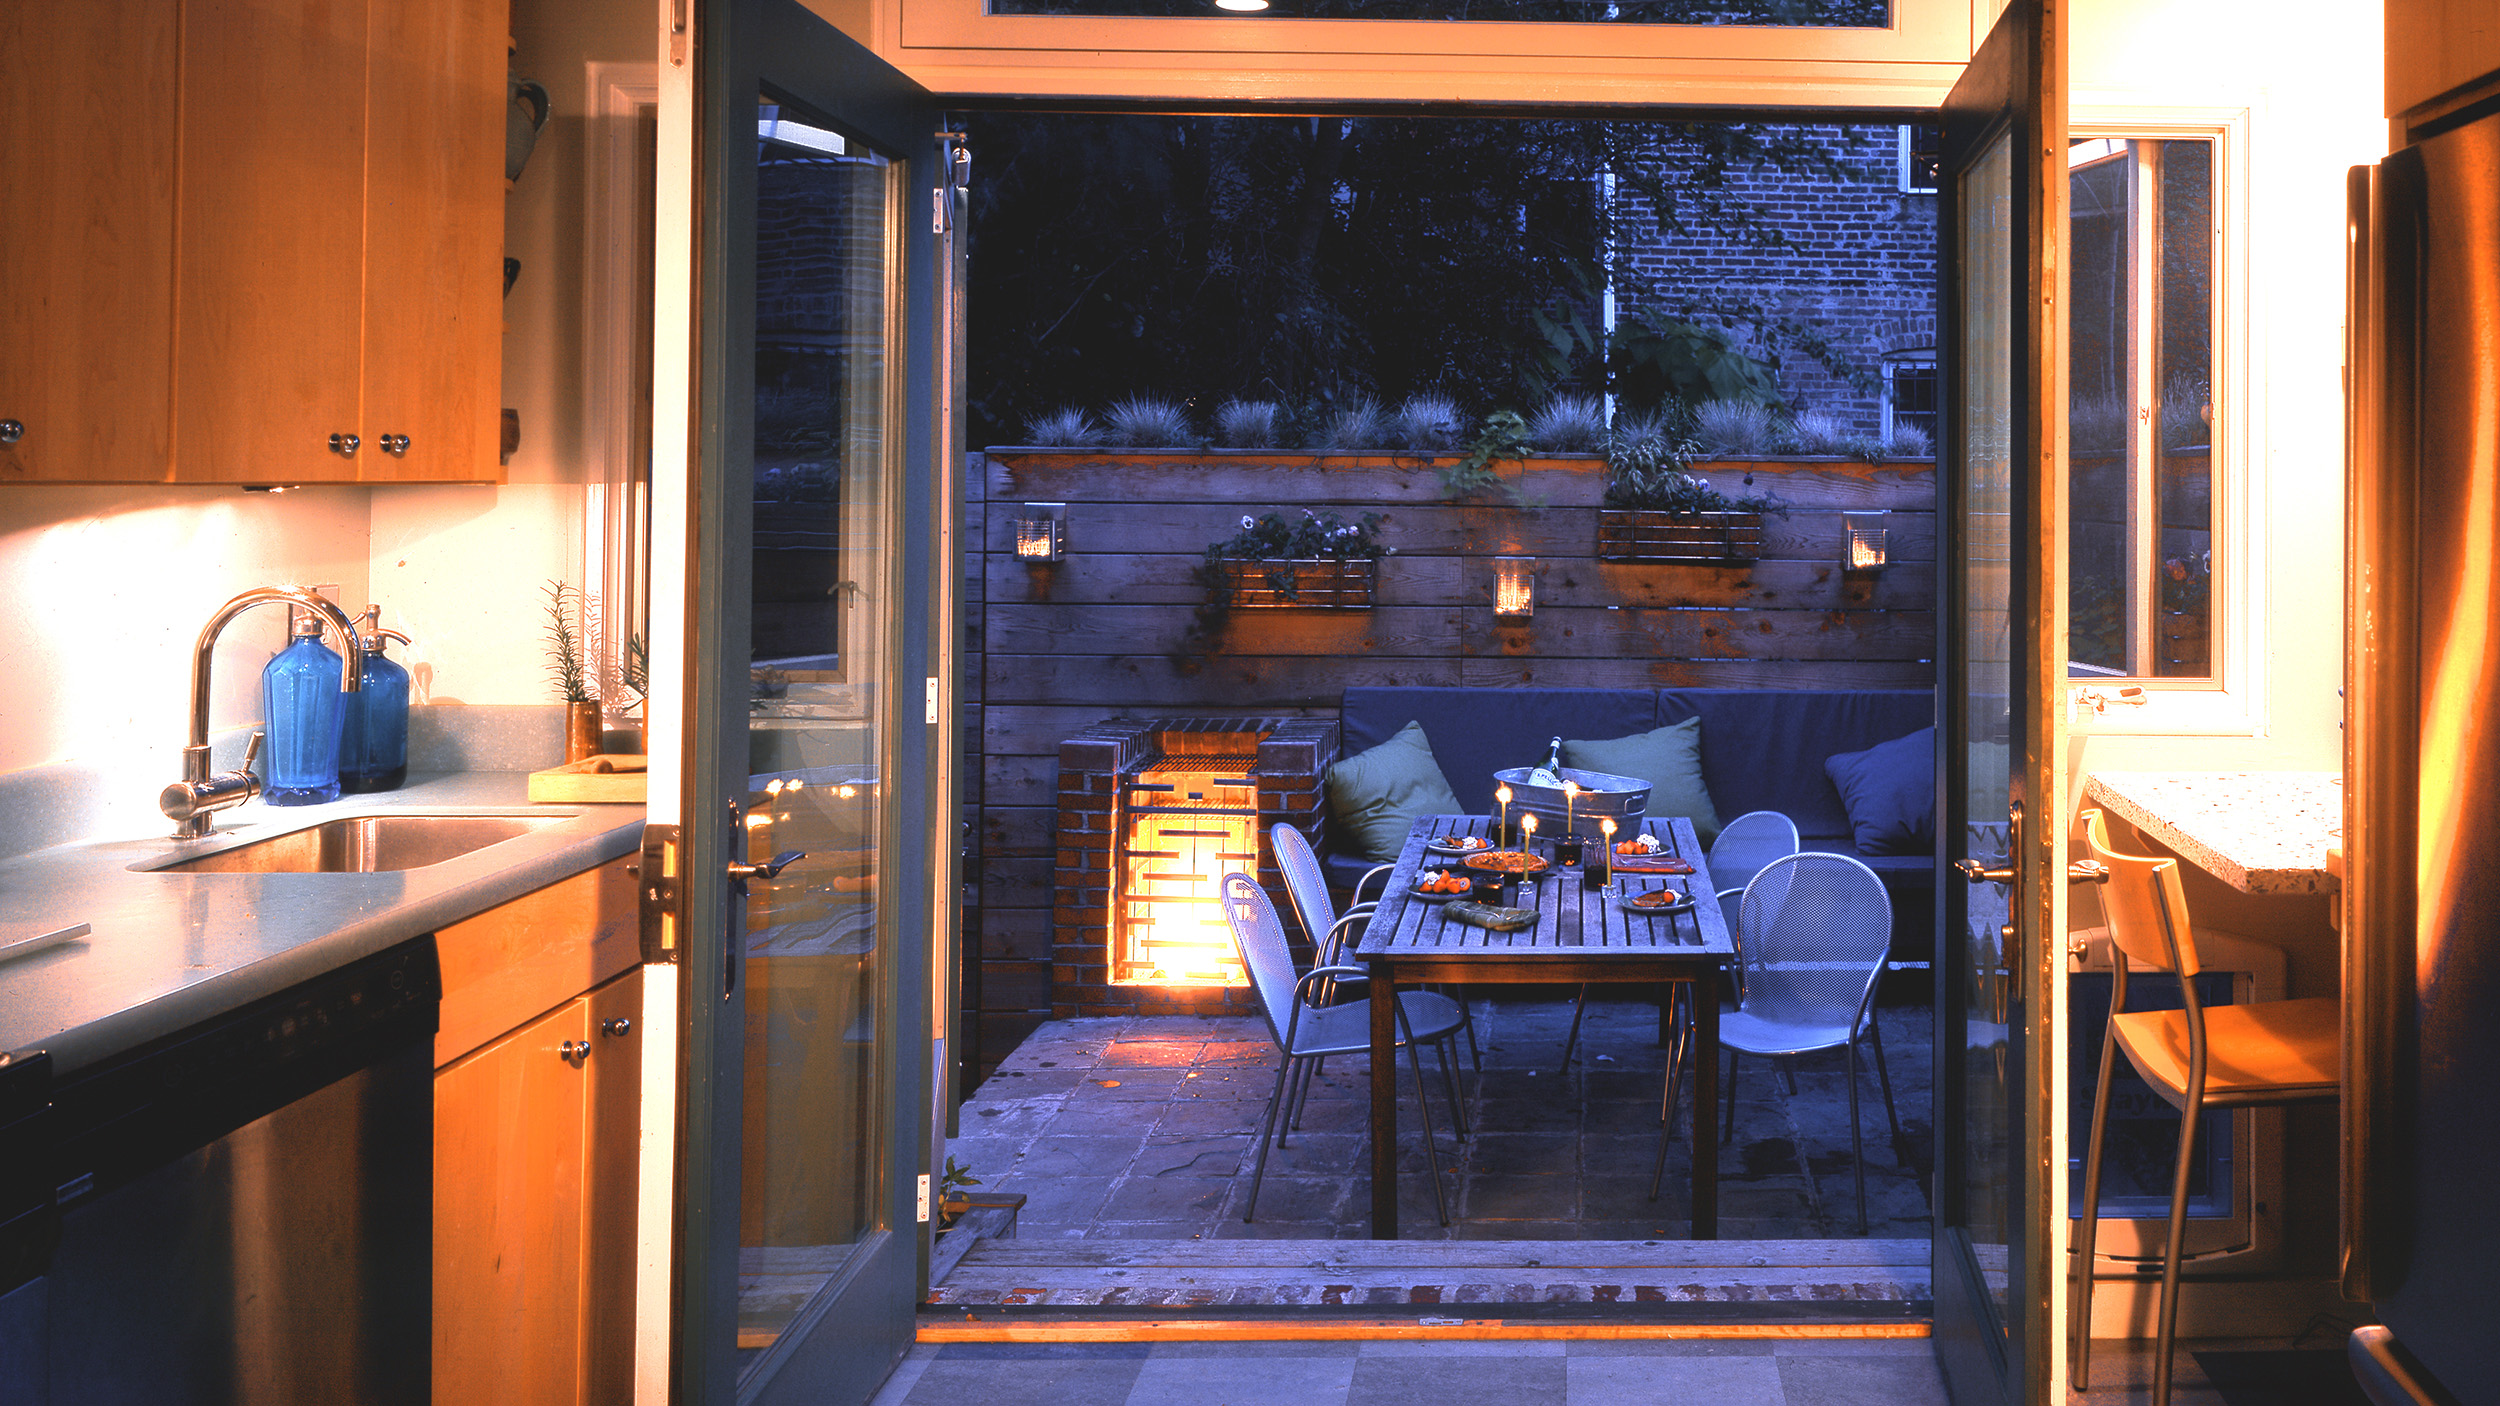 4w kitchen - dusk view to patio.jpg